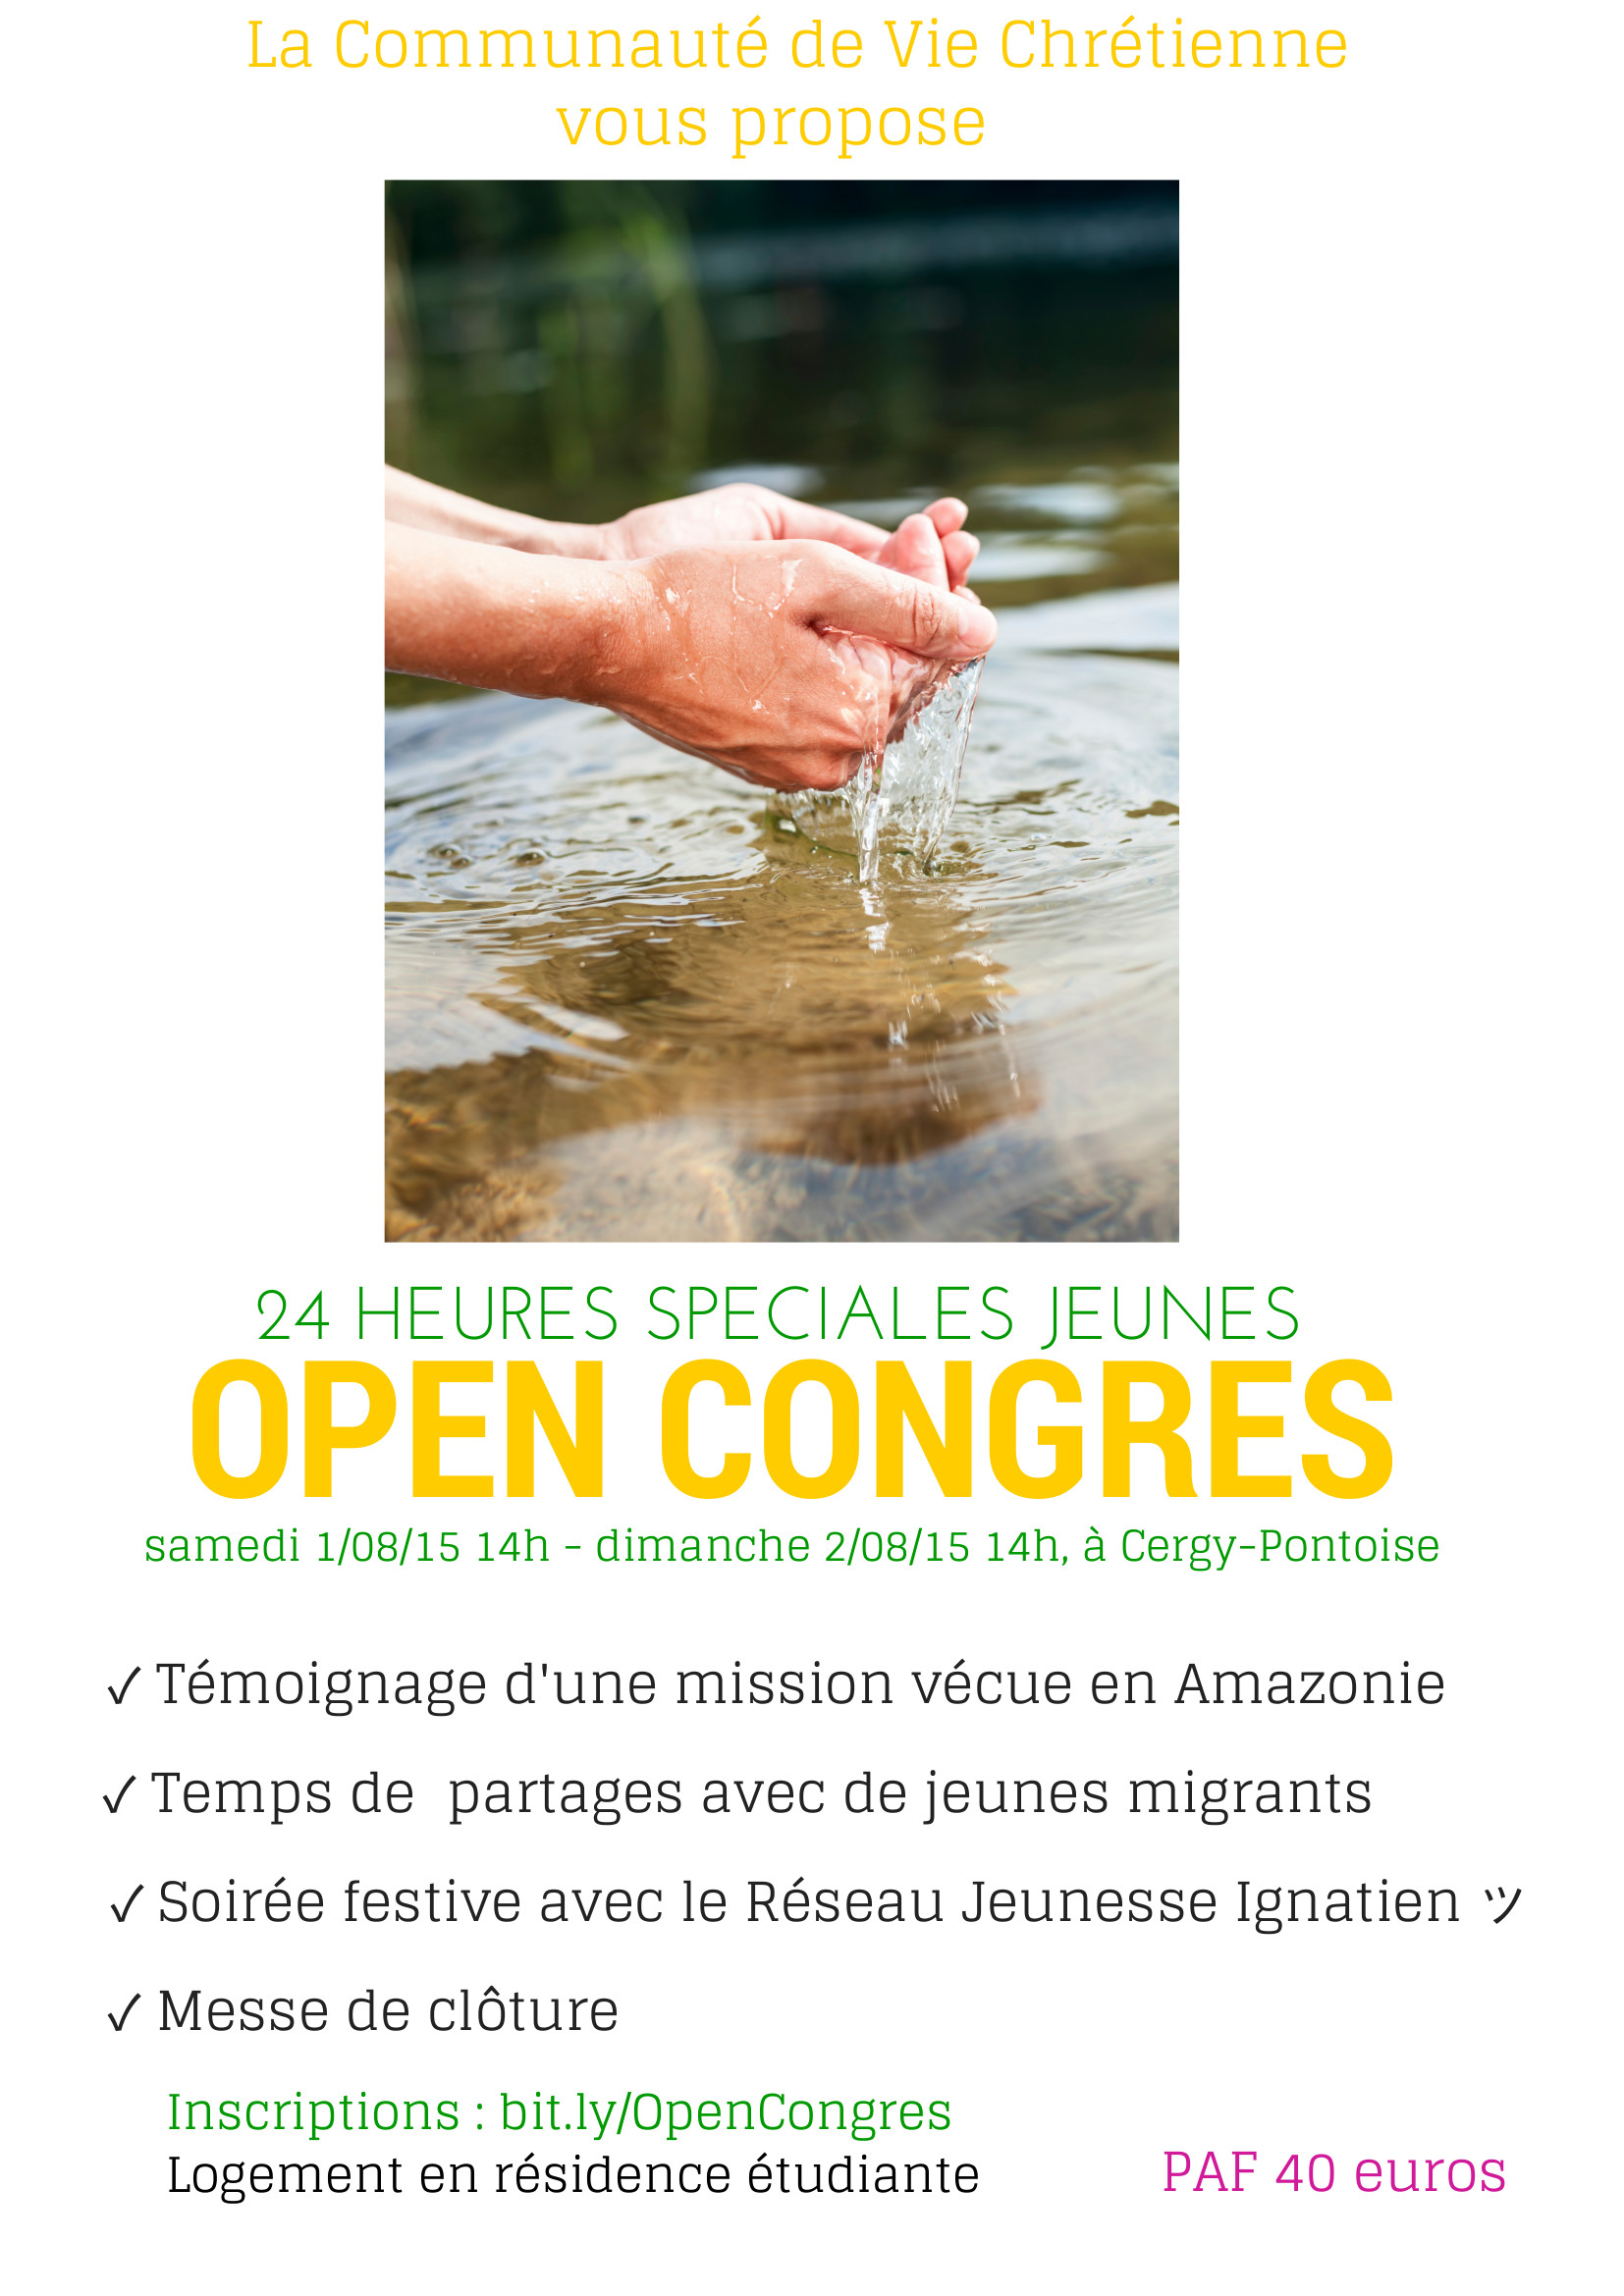 Open Congres visuel